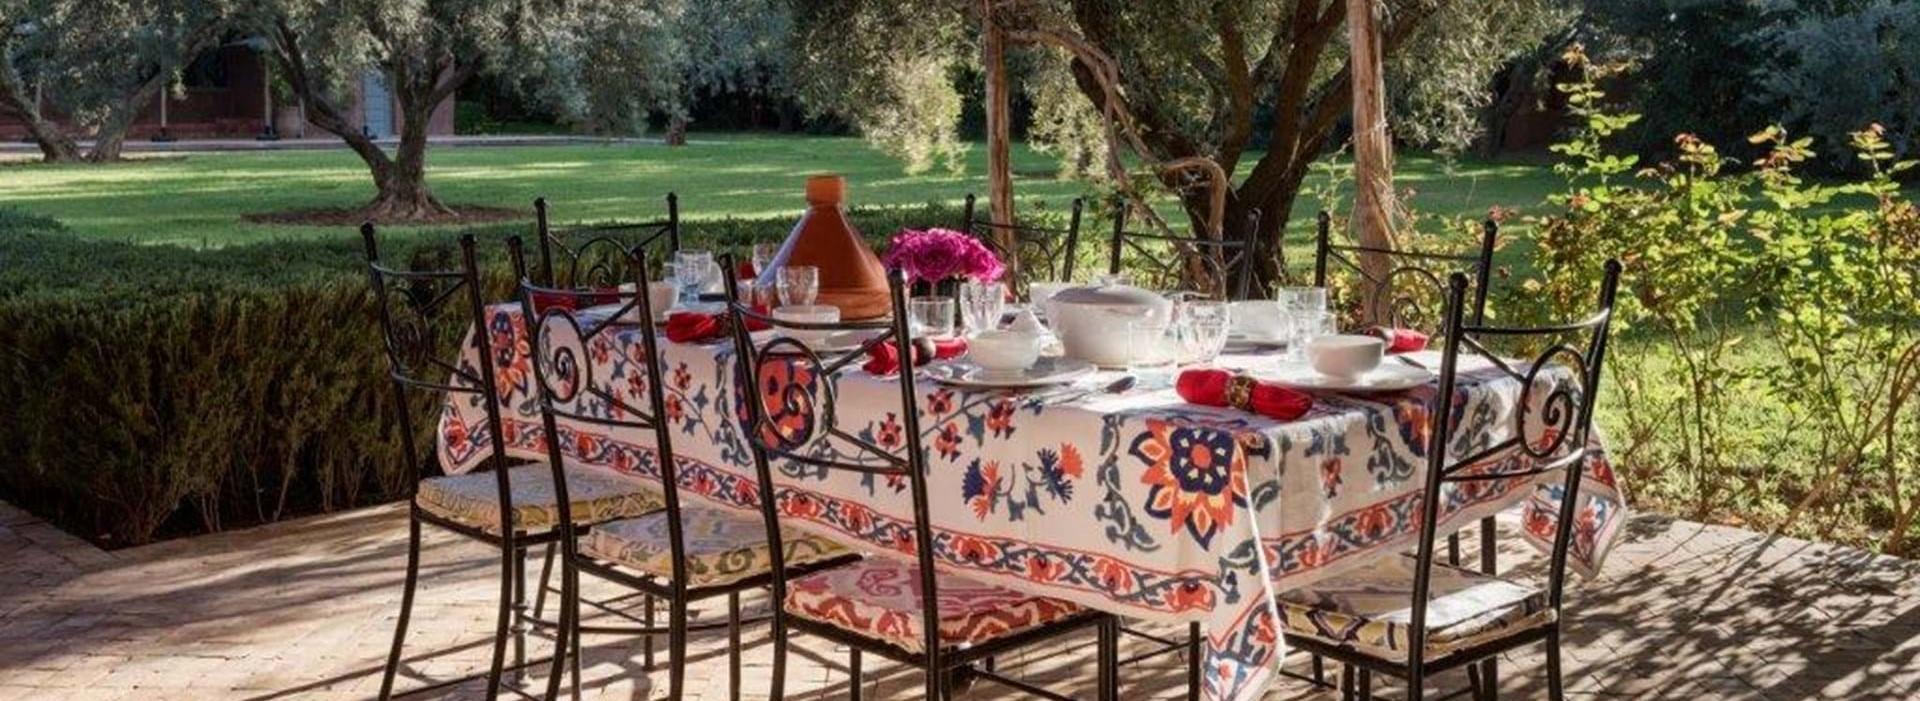 al-fresco-dining-villa-mauresque